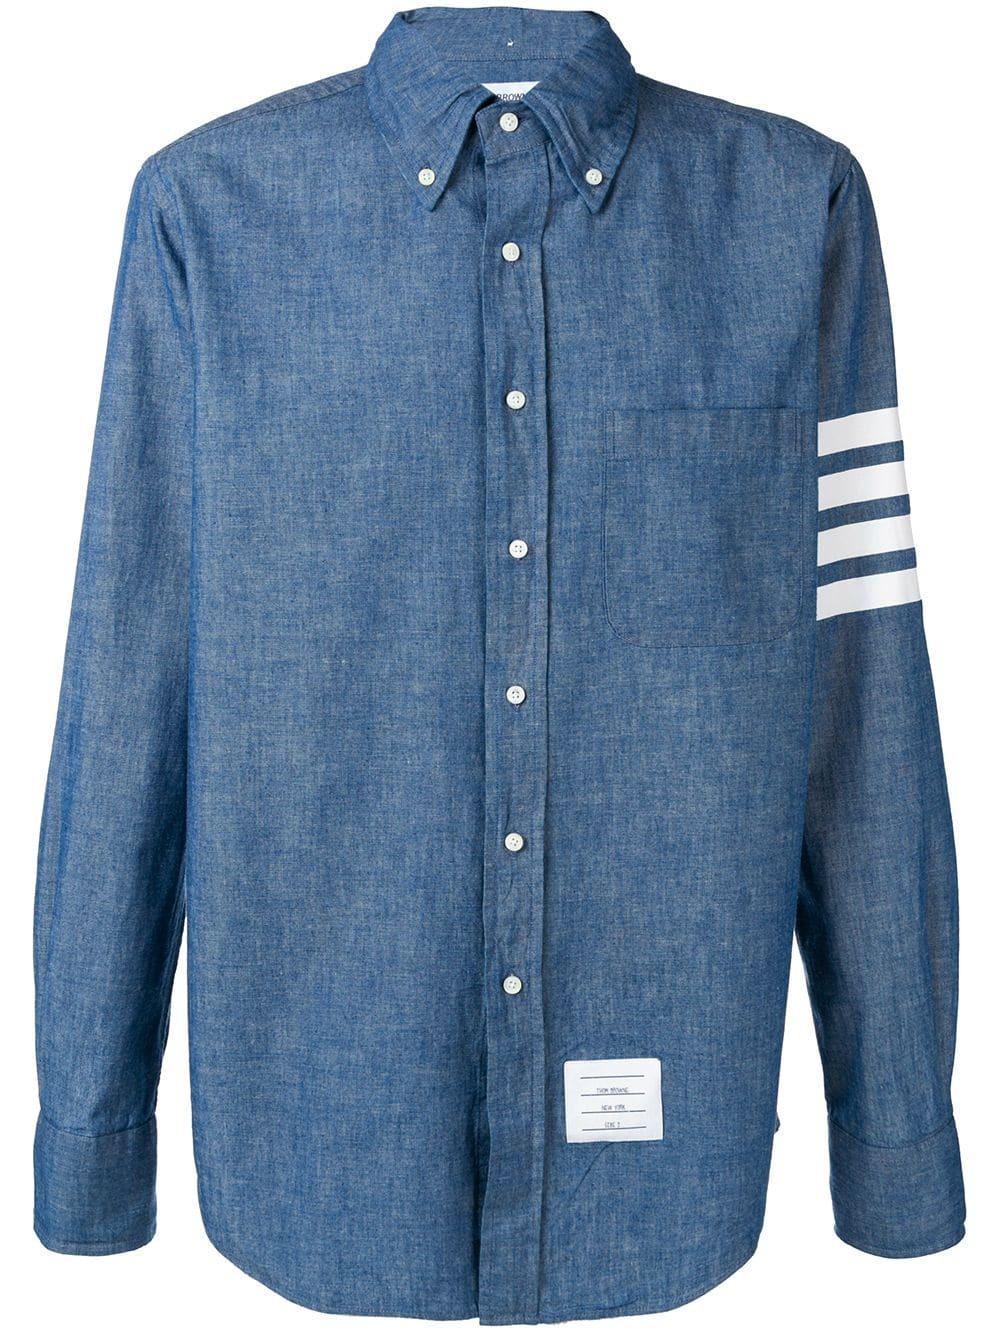 Thom Browne 4 Bar Straight Fit Chambray Shirt